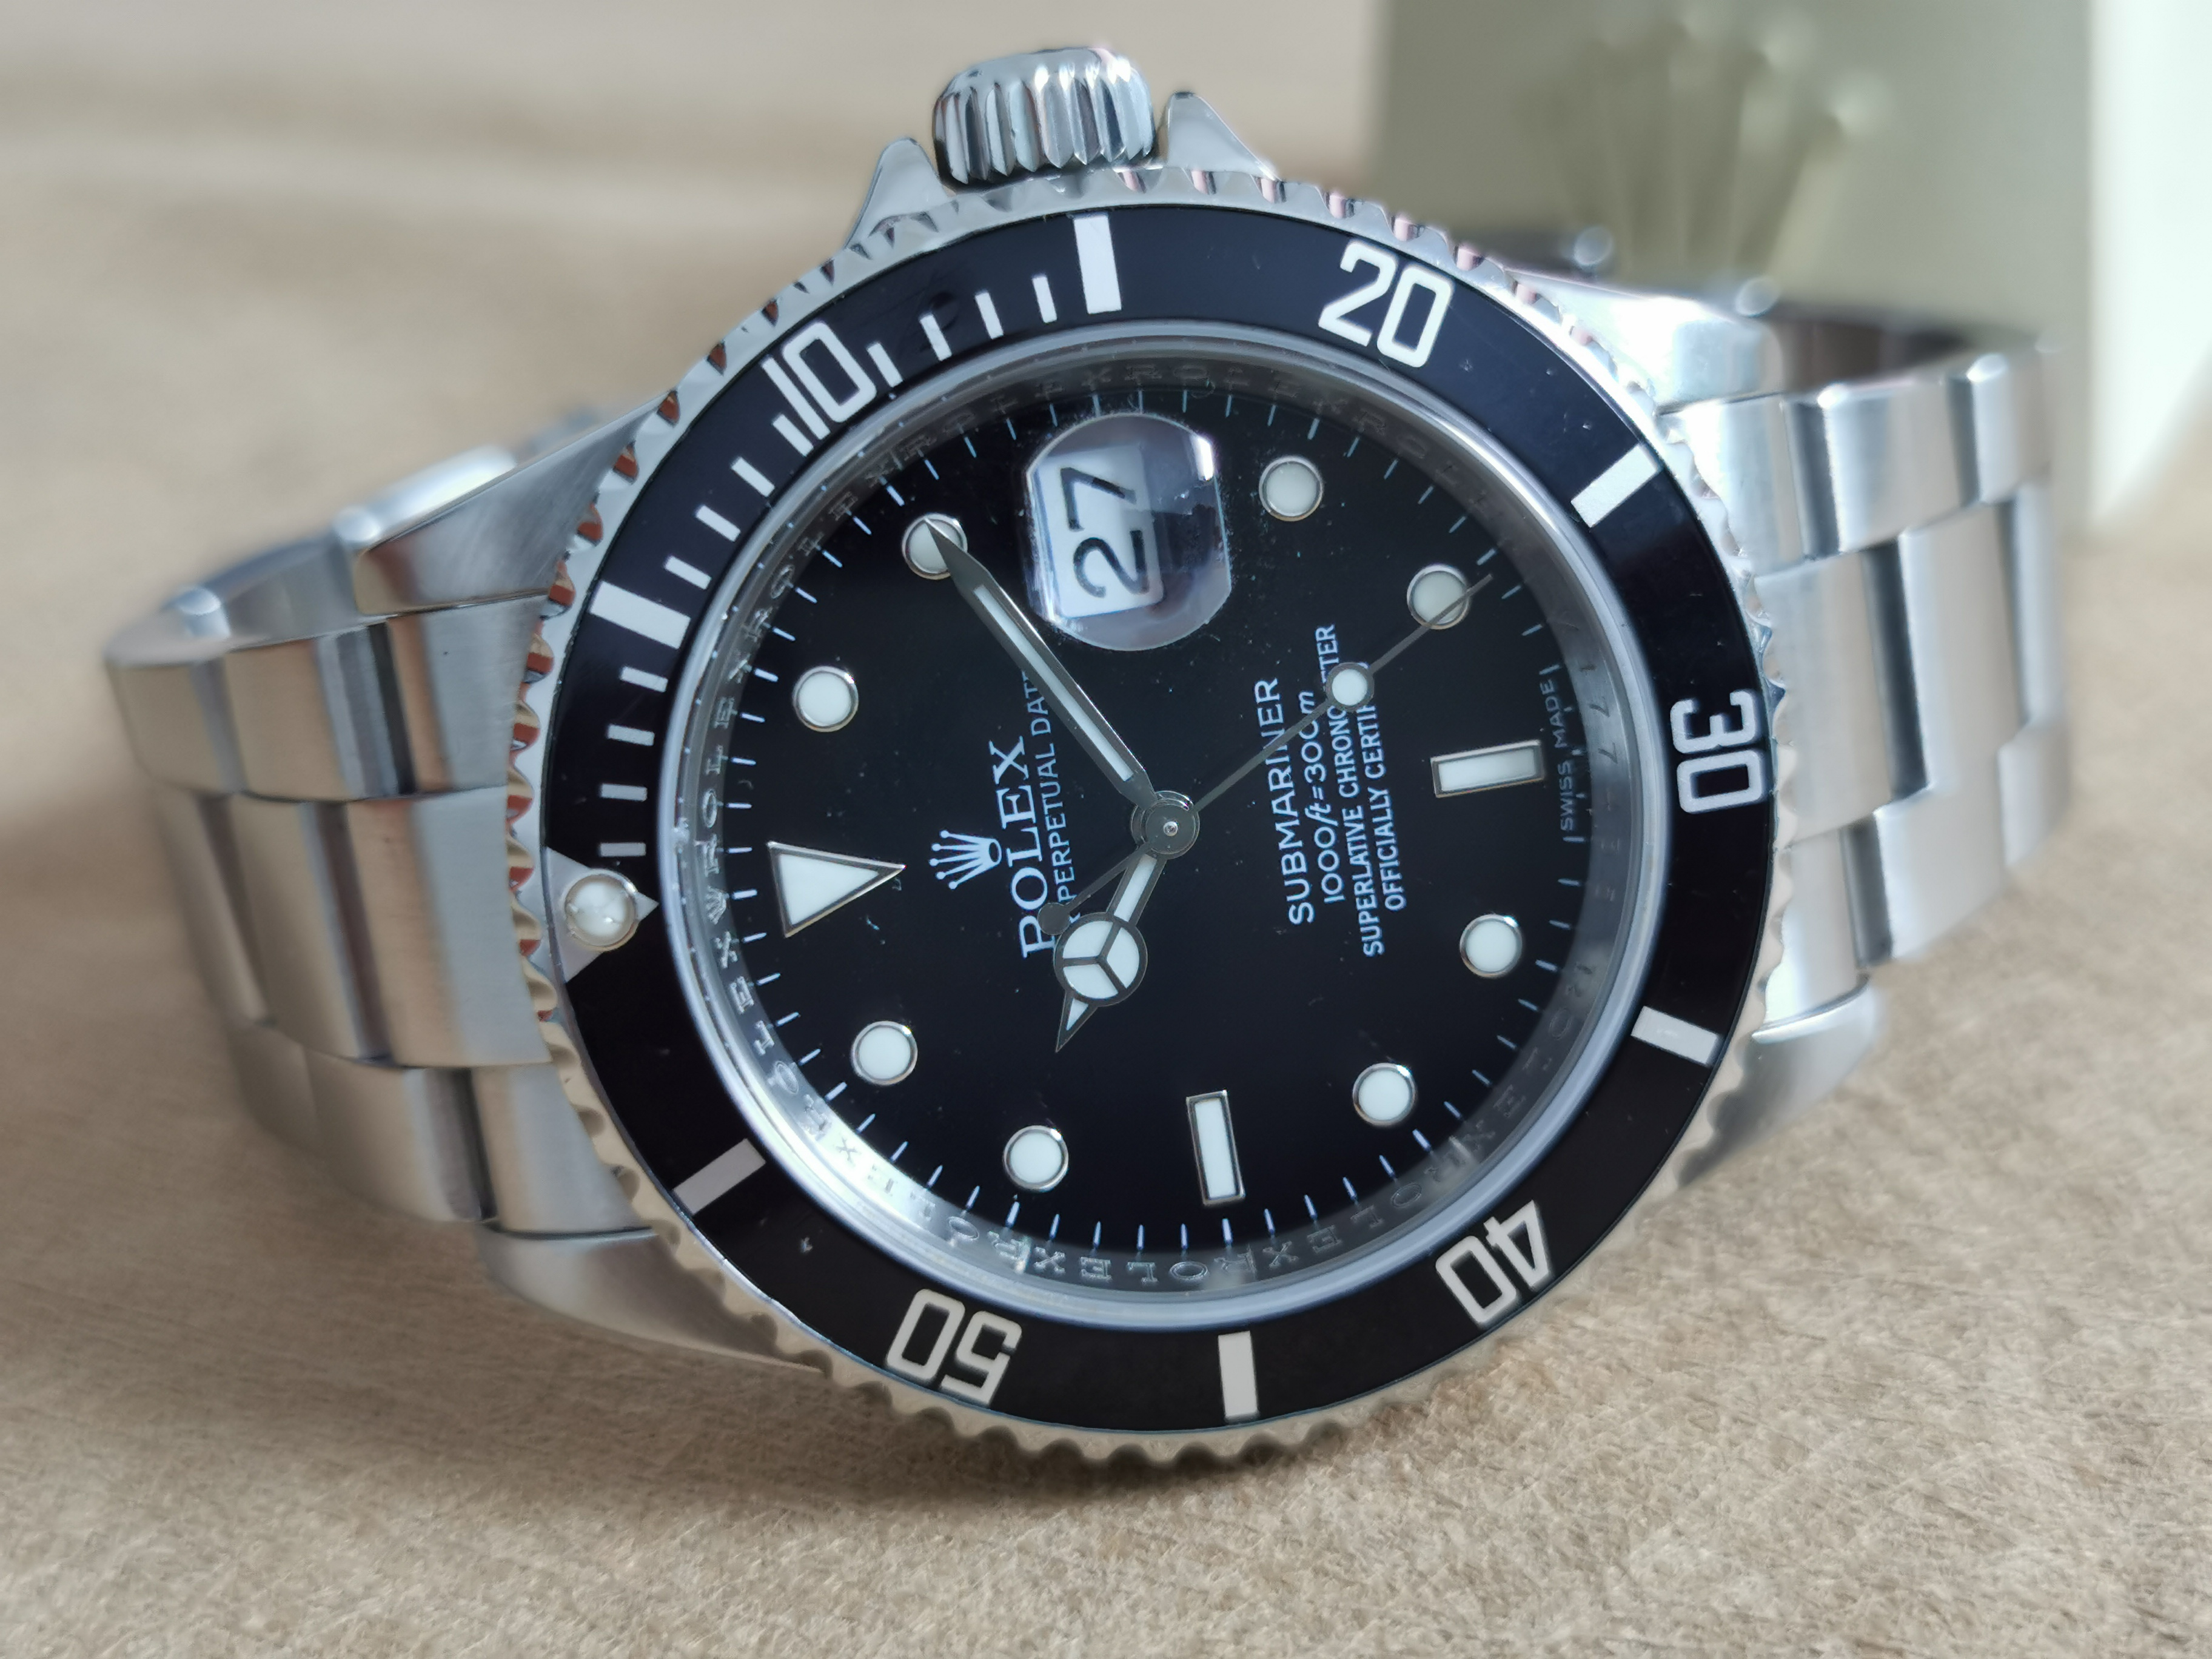 Rolex Submariner Submariner Date 16610 RRR box and warranty 2008 | San Giorgio a Cremano